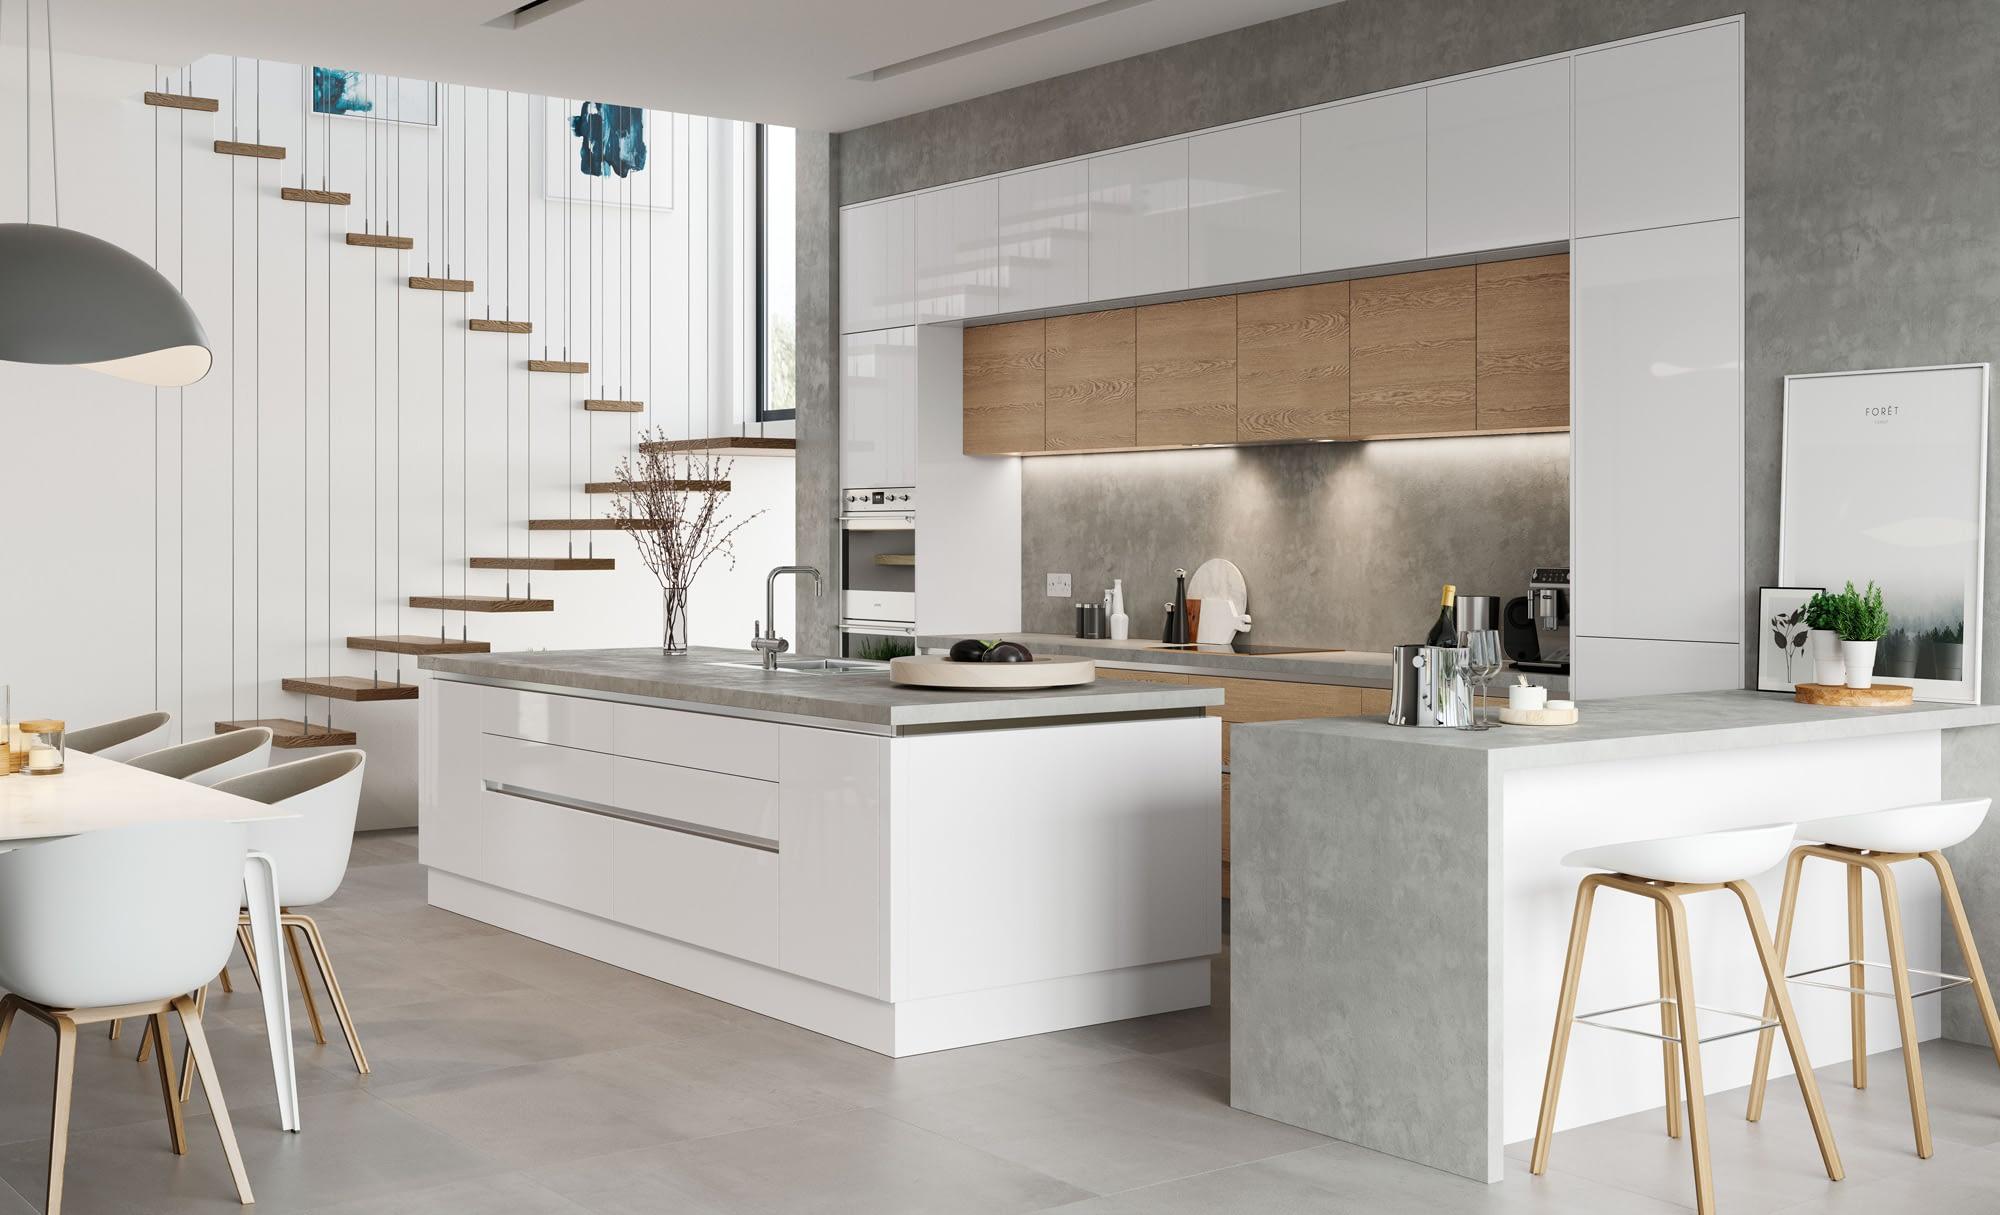 Kitchen Doors Peterborough ZOLA GLOSS HANDLELESS White & Tavola Parched Oak